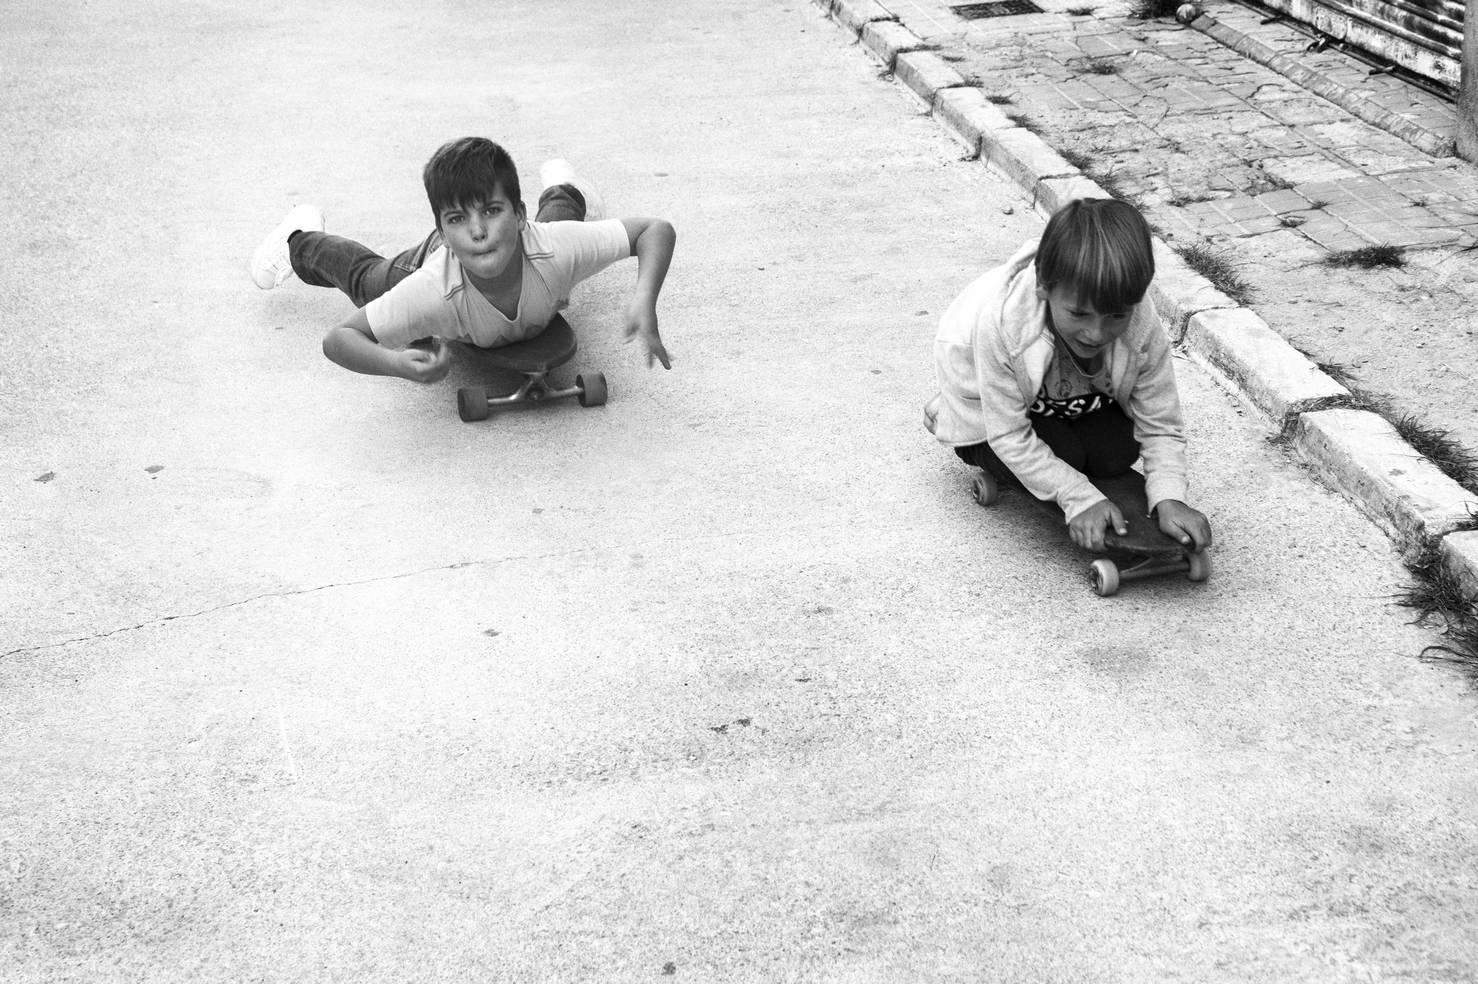 Niños Riders/Long Days/Longboard